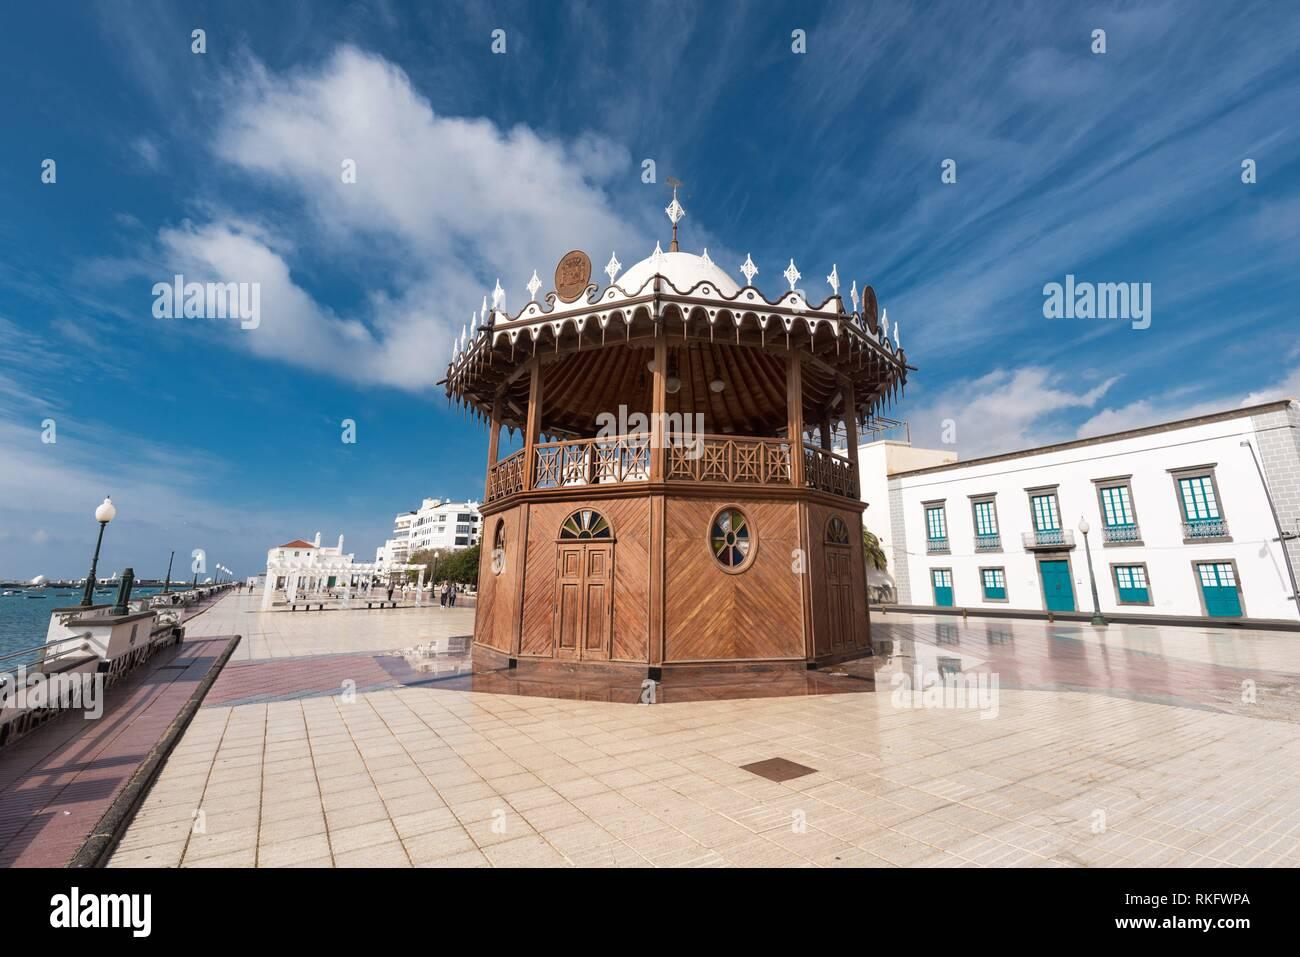 Arrecife cityscape, bandstand and promenade in Lanzarote, Canary islands, Spain. - Stock Image